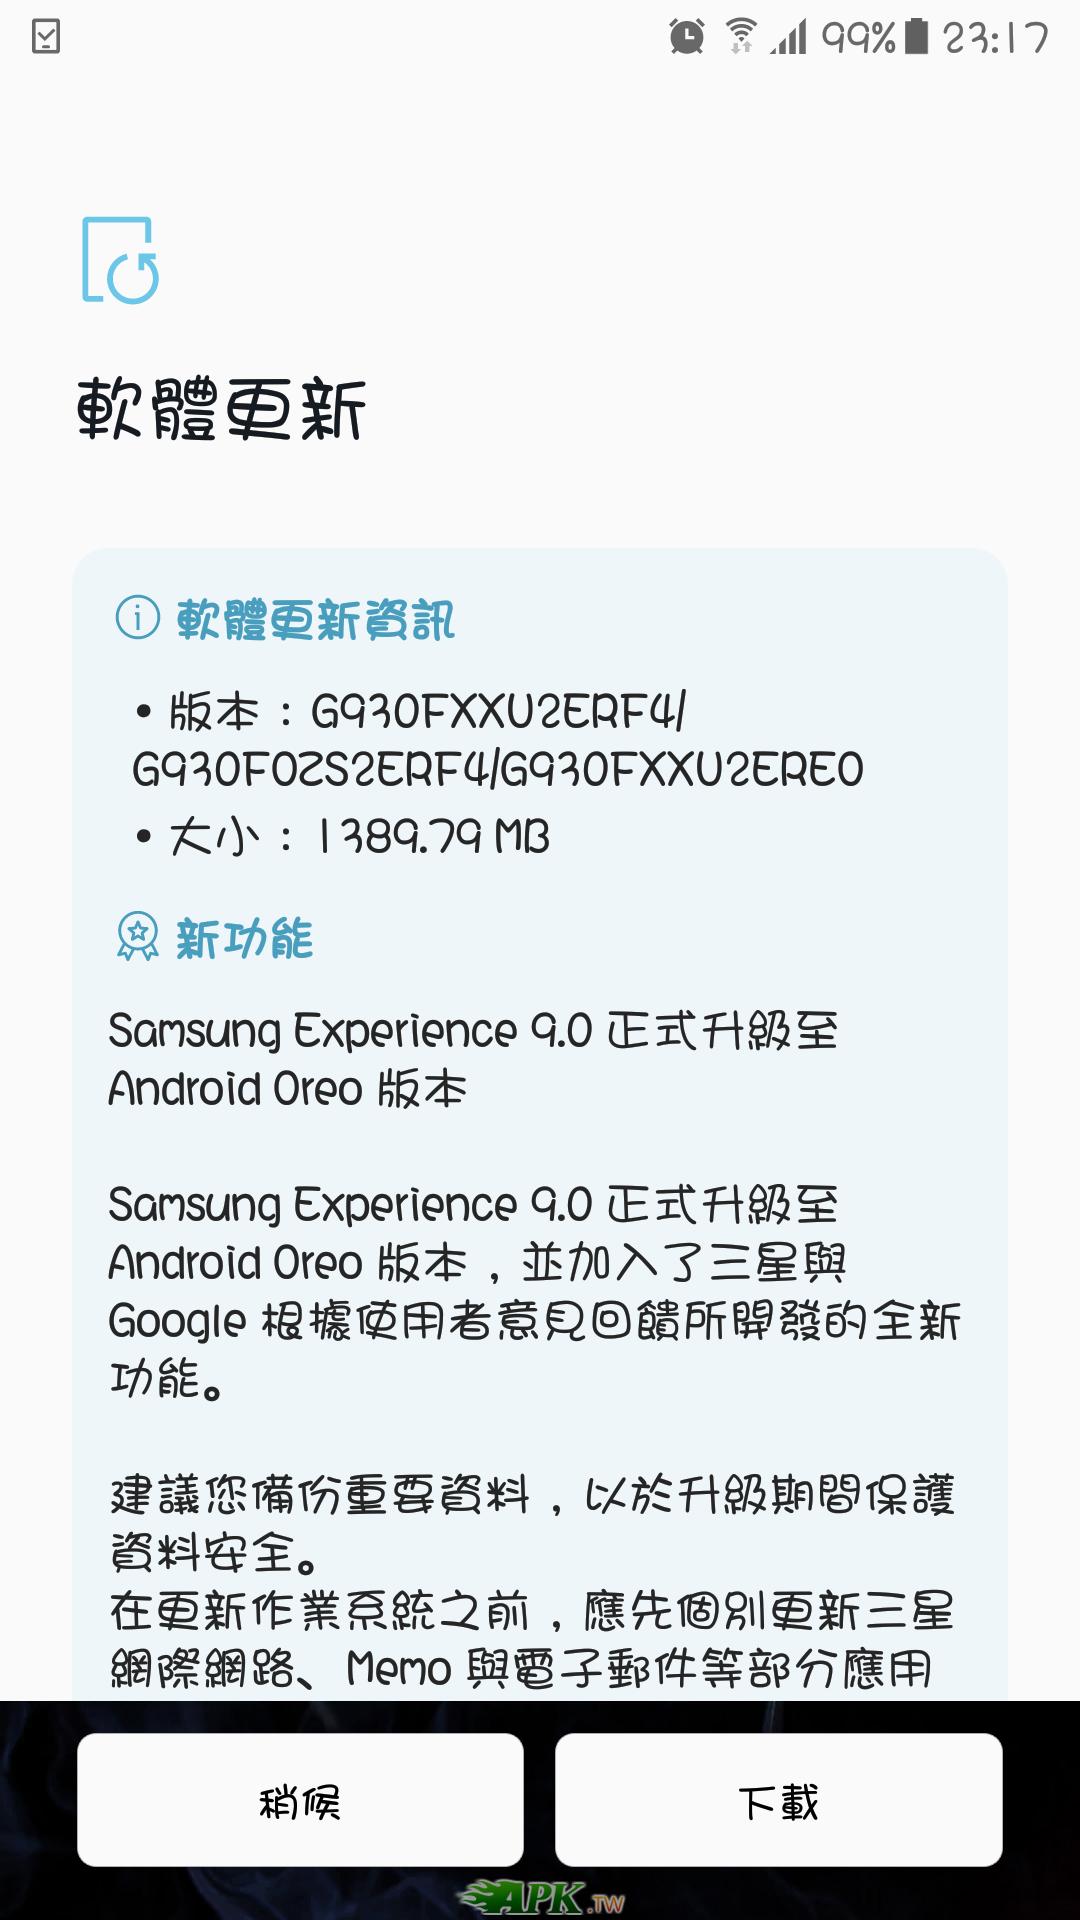 Screenshot_20180628-231748.png